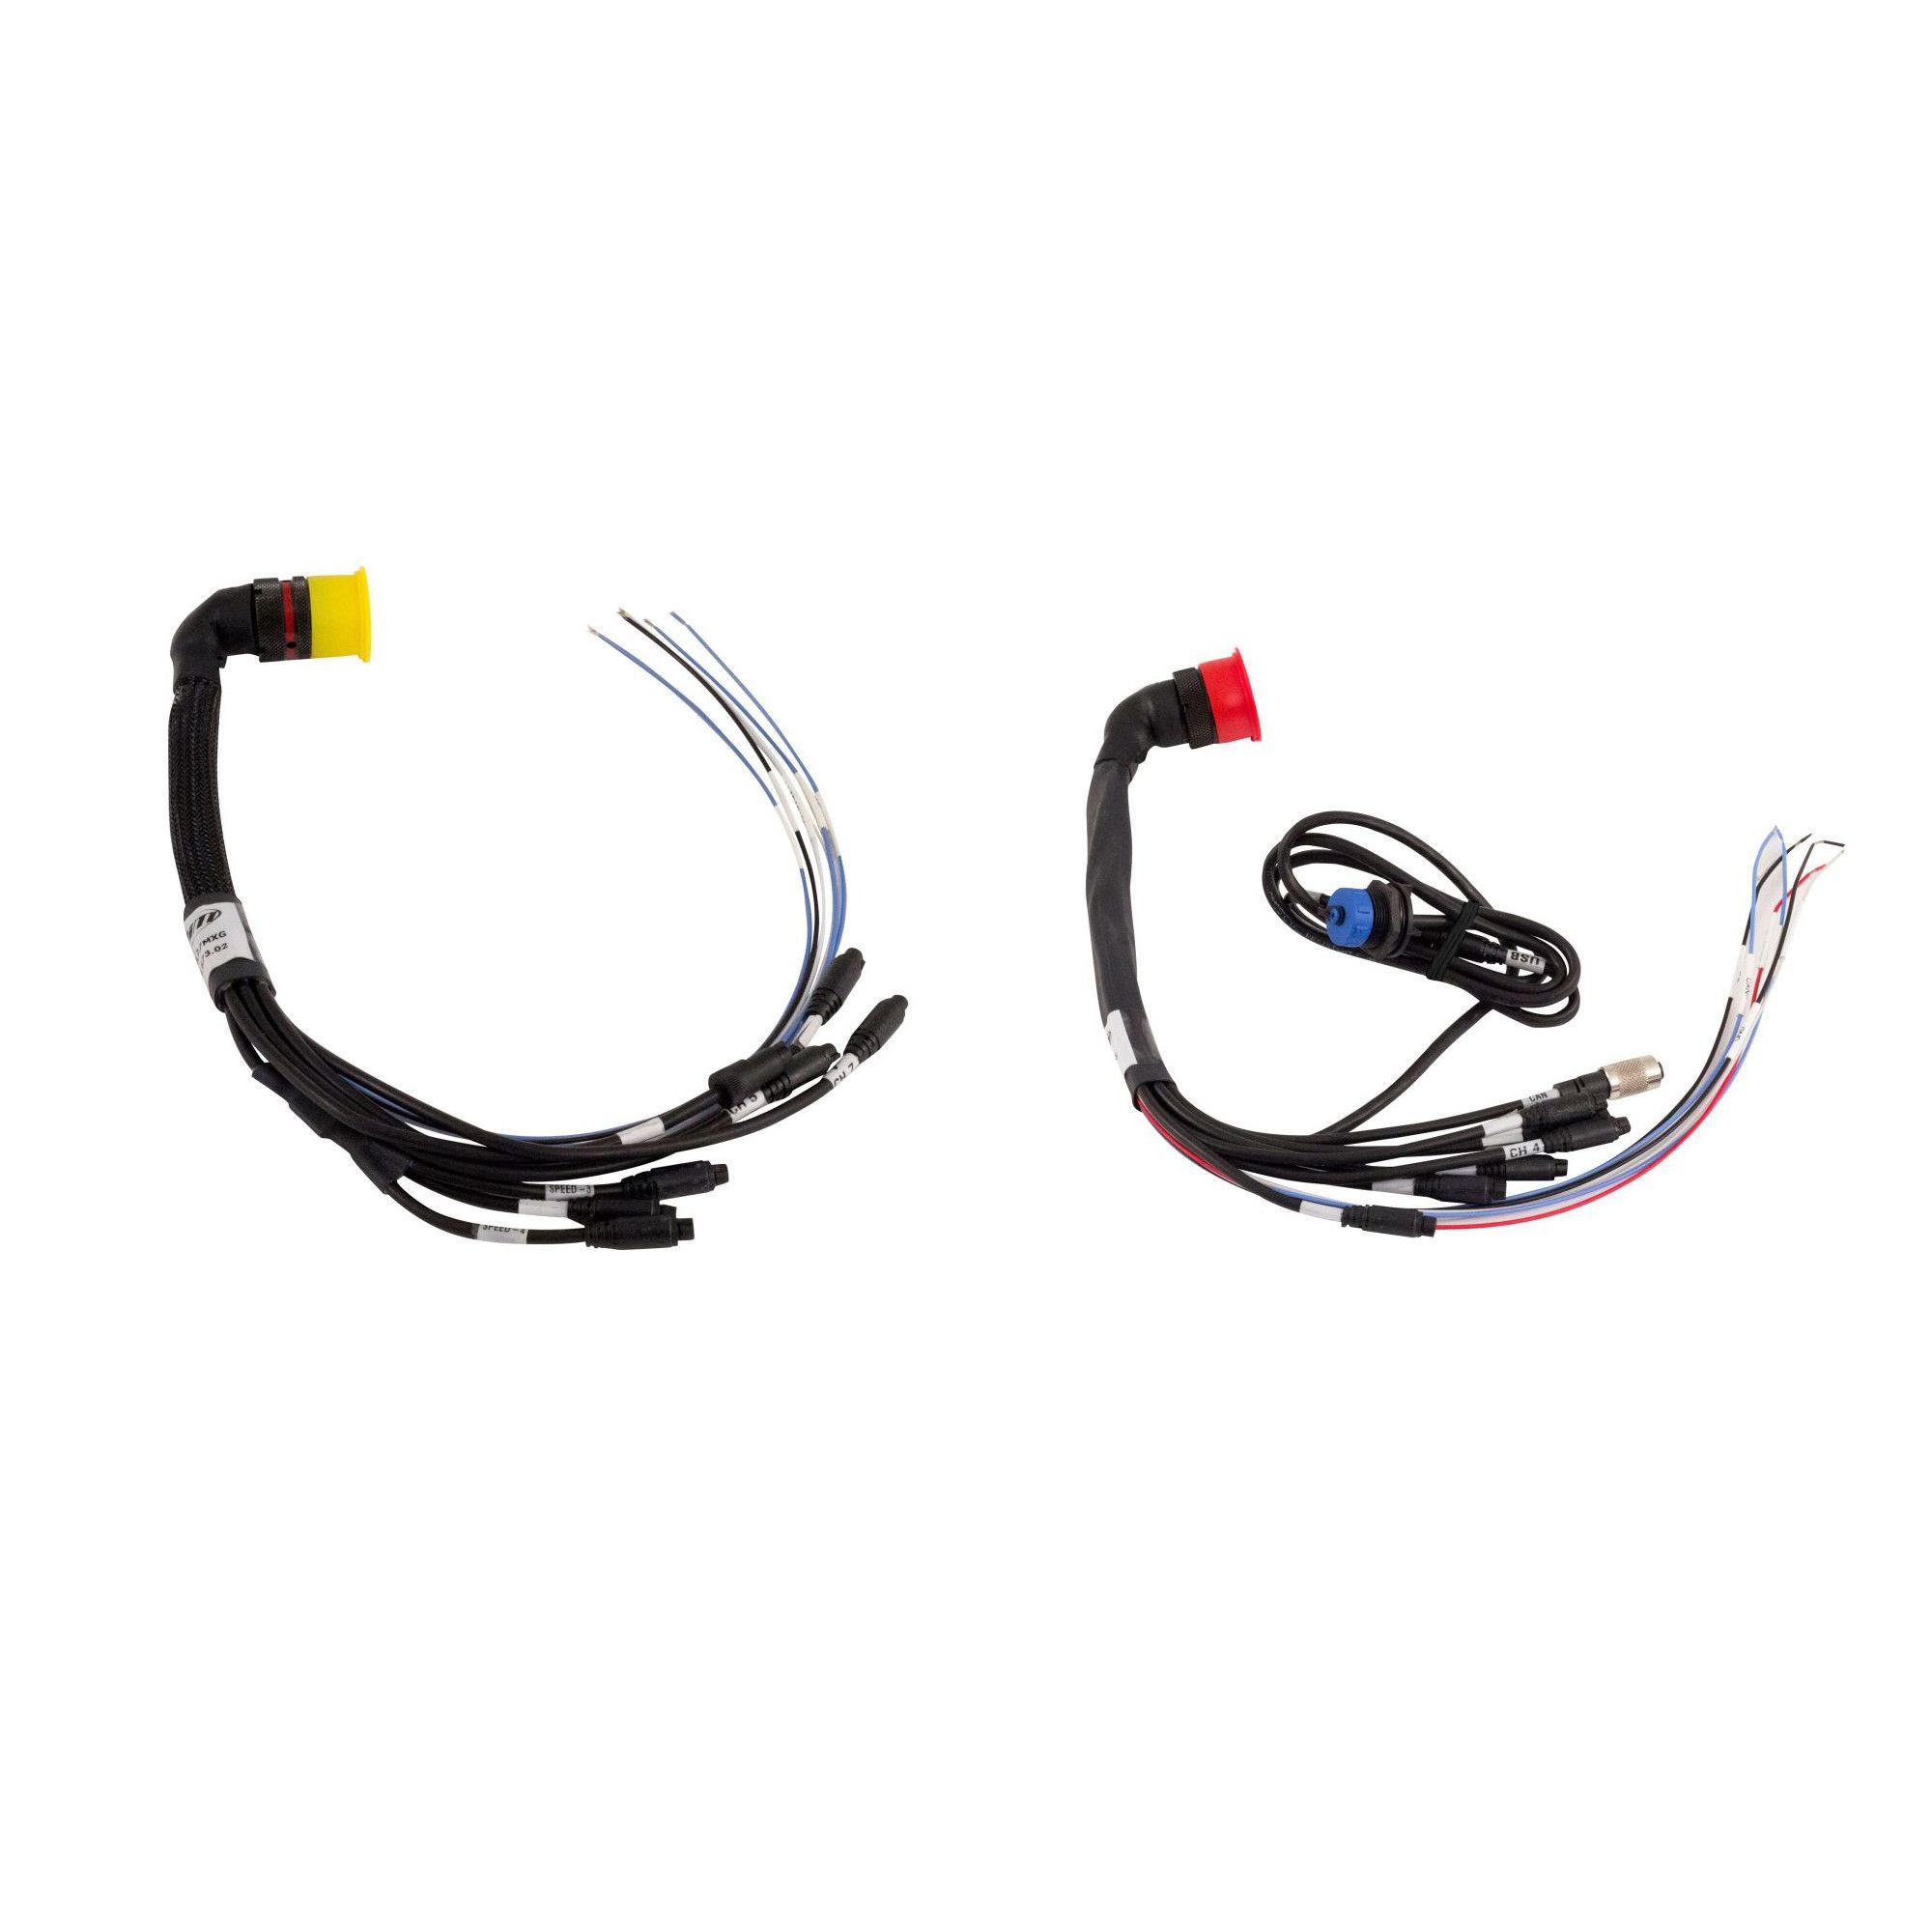 Aim Mxg Mxs Mxl2 Dash Logger Optional Harness 22 Pins